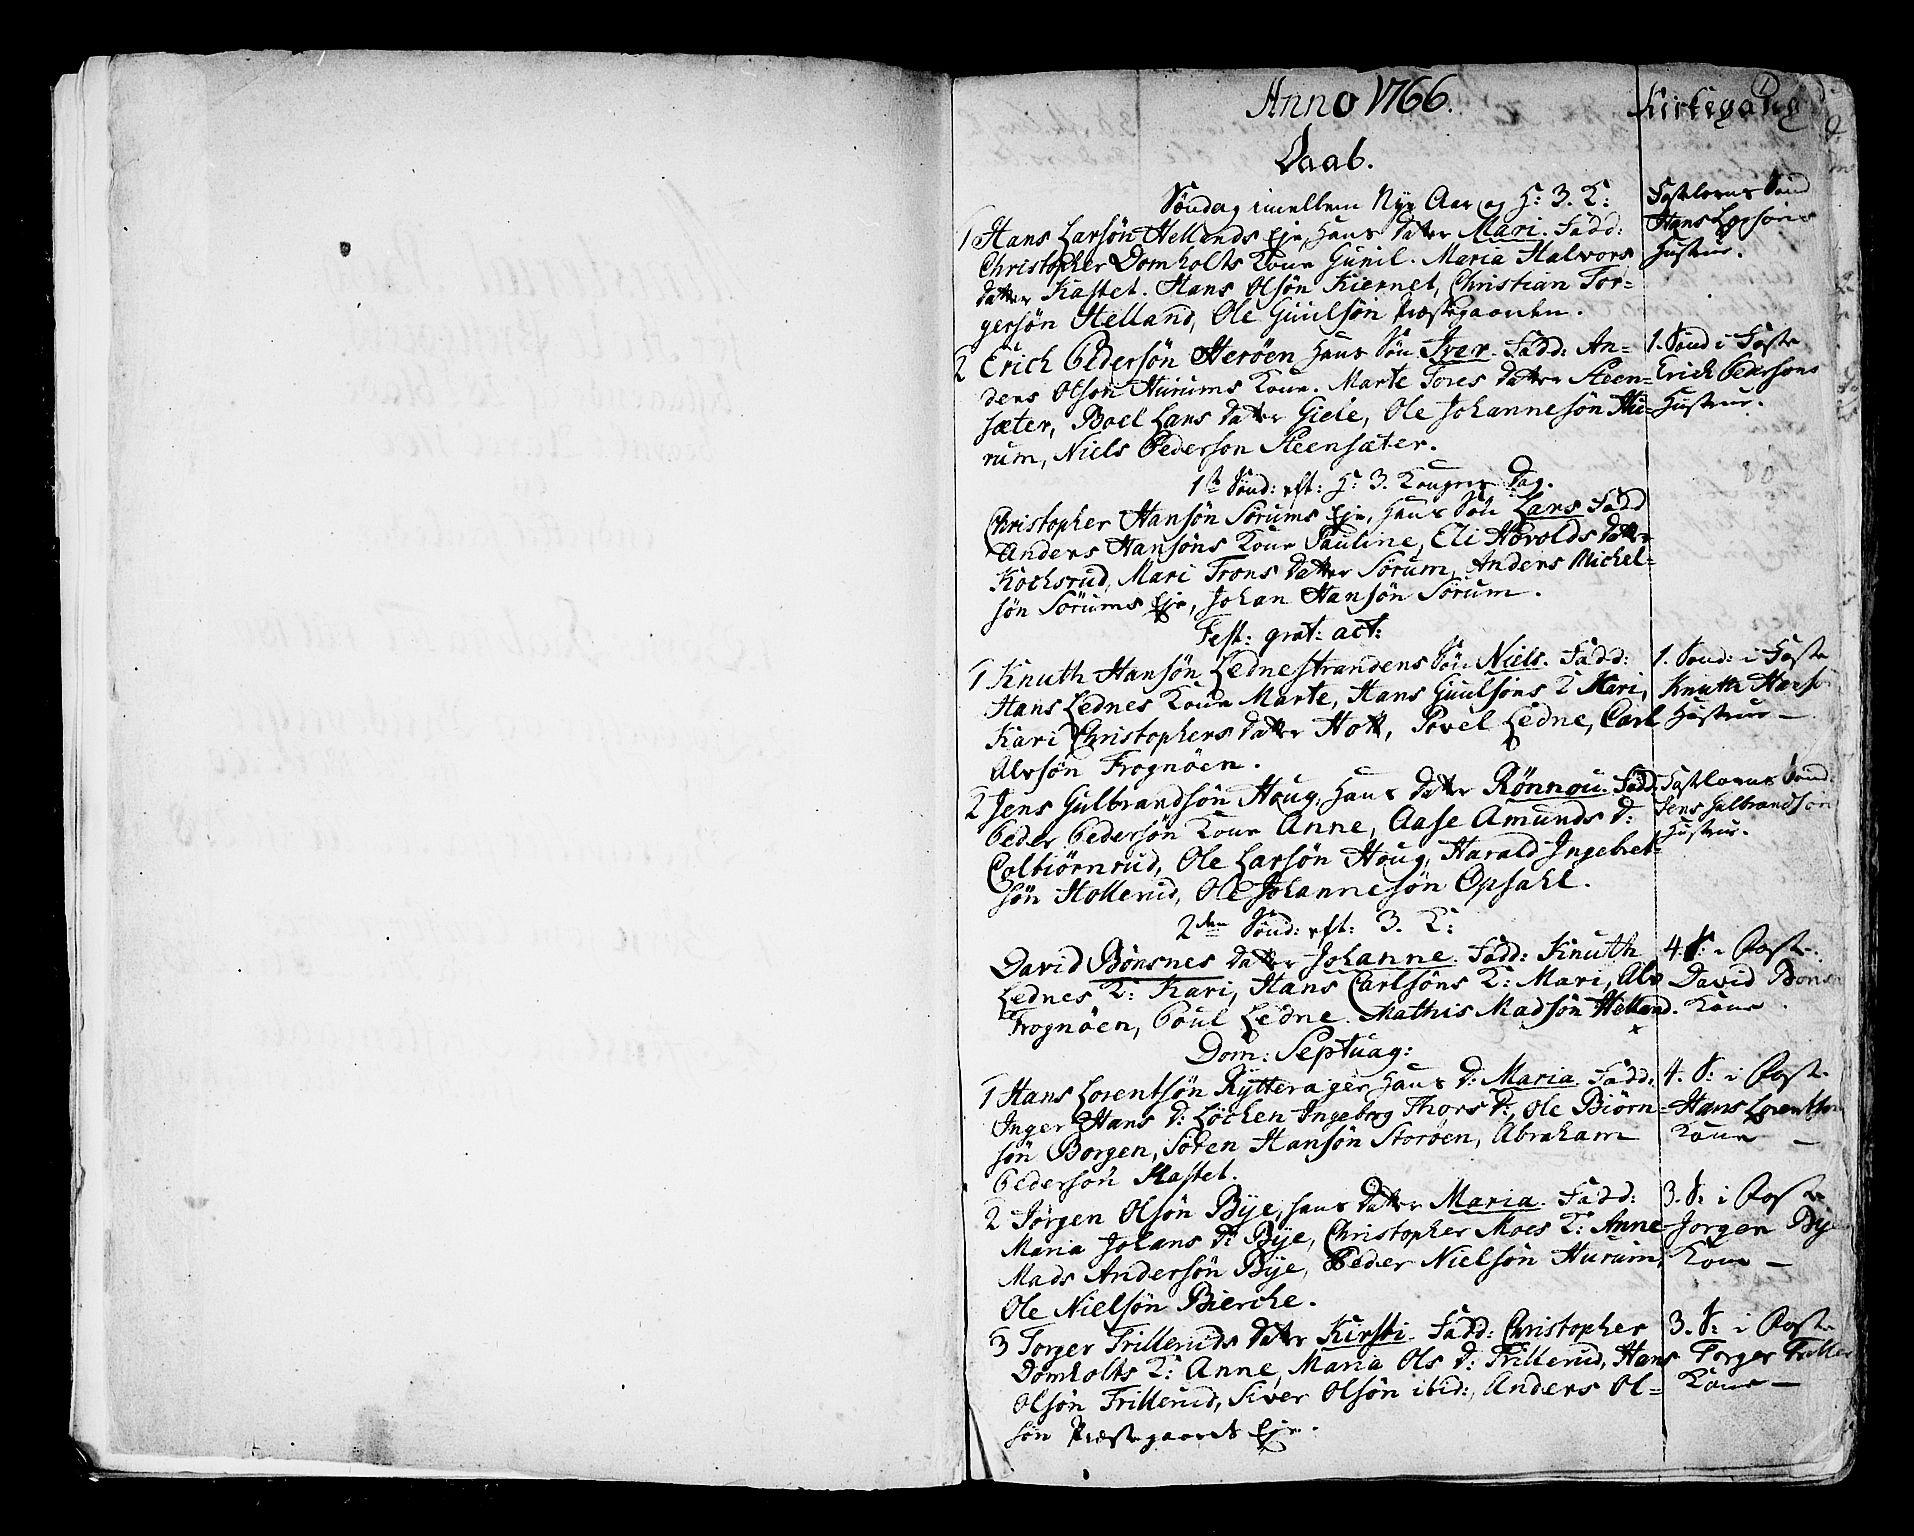 SAKO, Hole kirkebøker, F/Fa/L0002: Ministerialbok nr. I 2, 1766-1814, s. 1